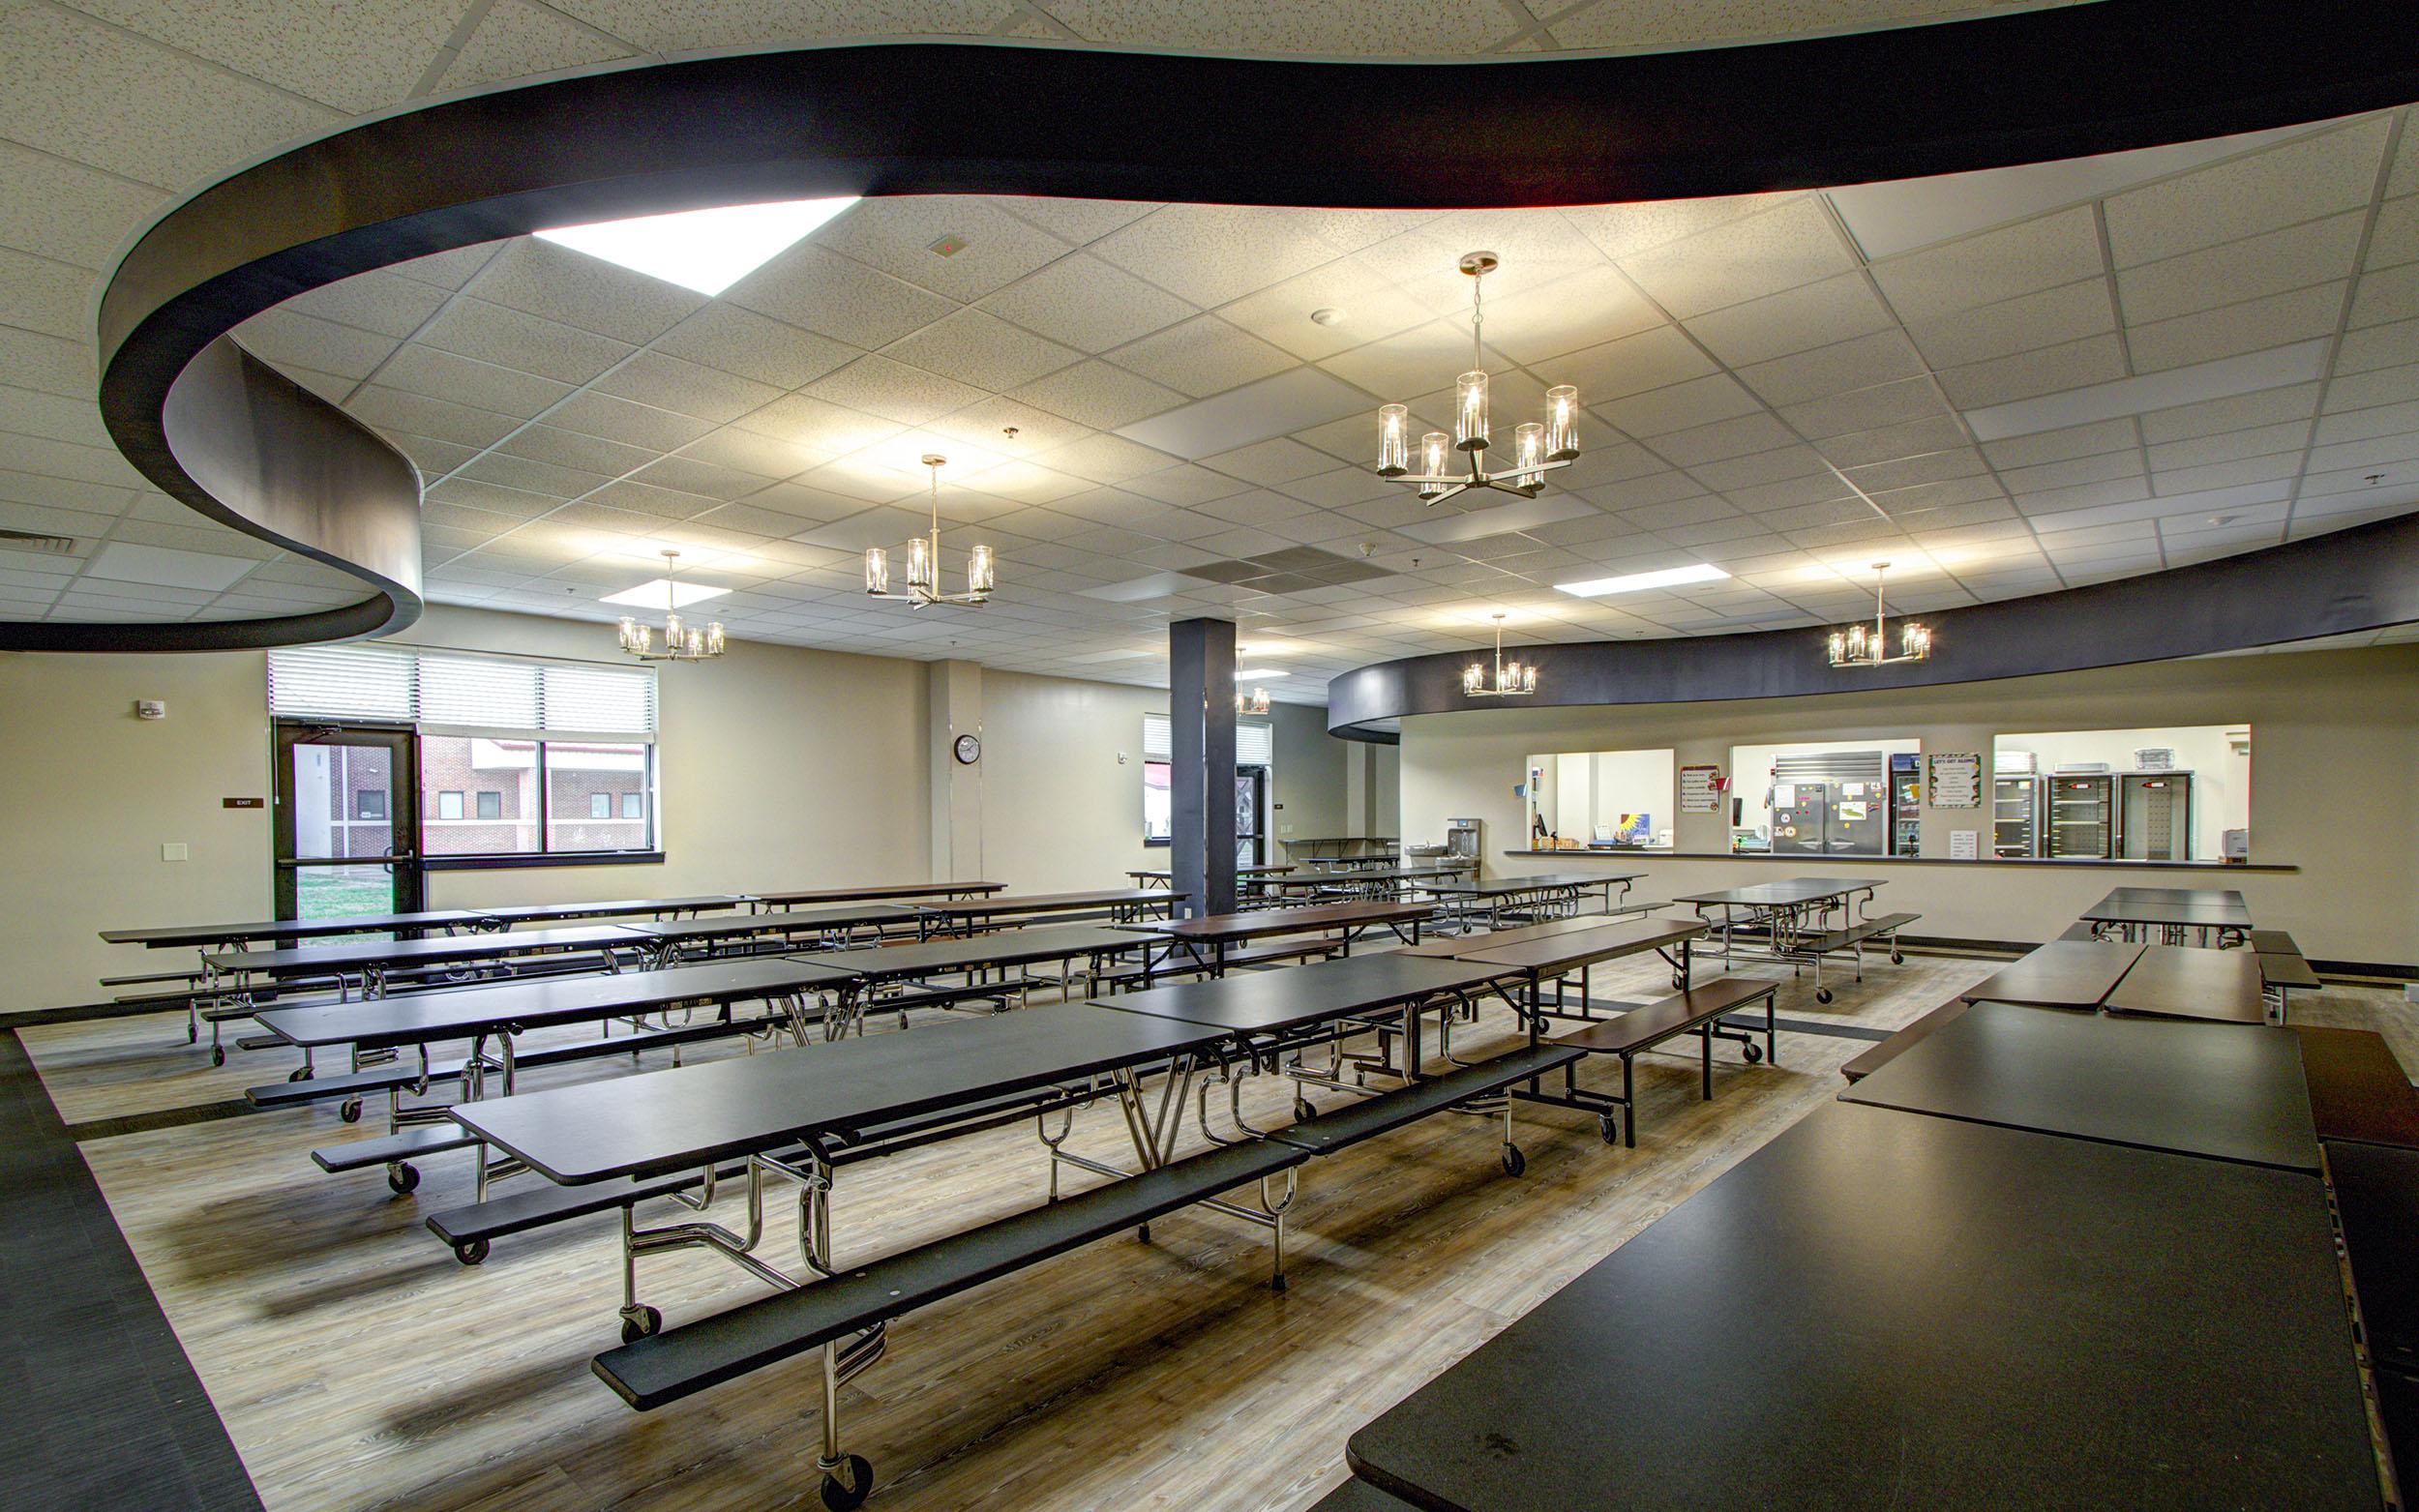 Union Academy Campus